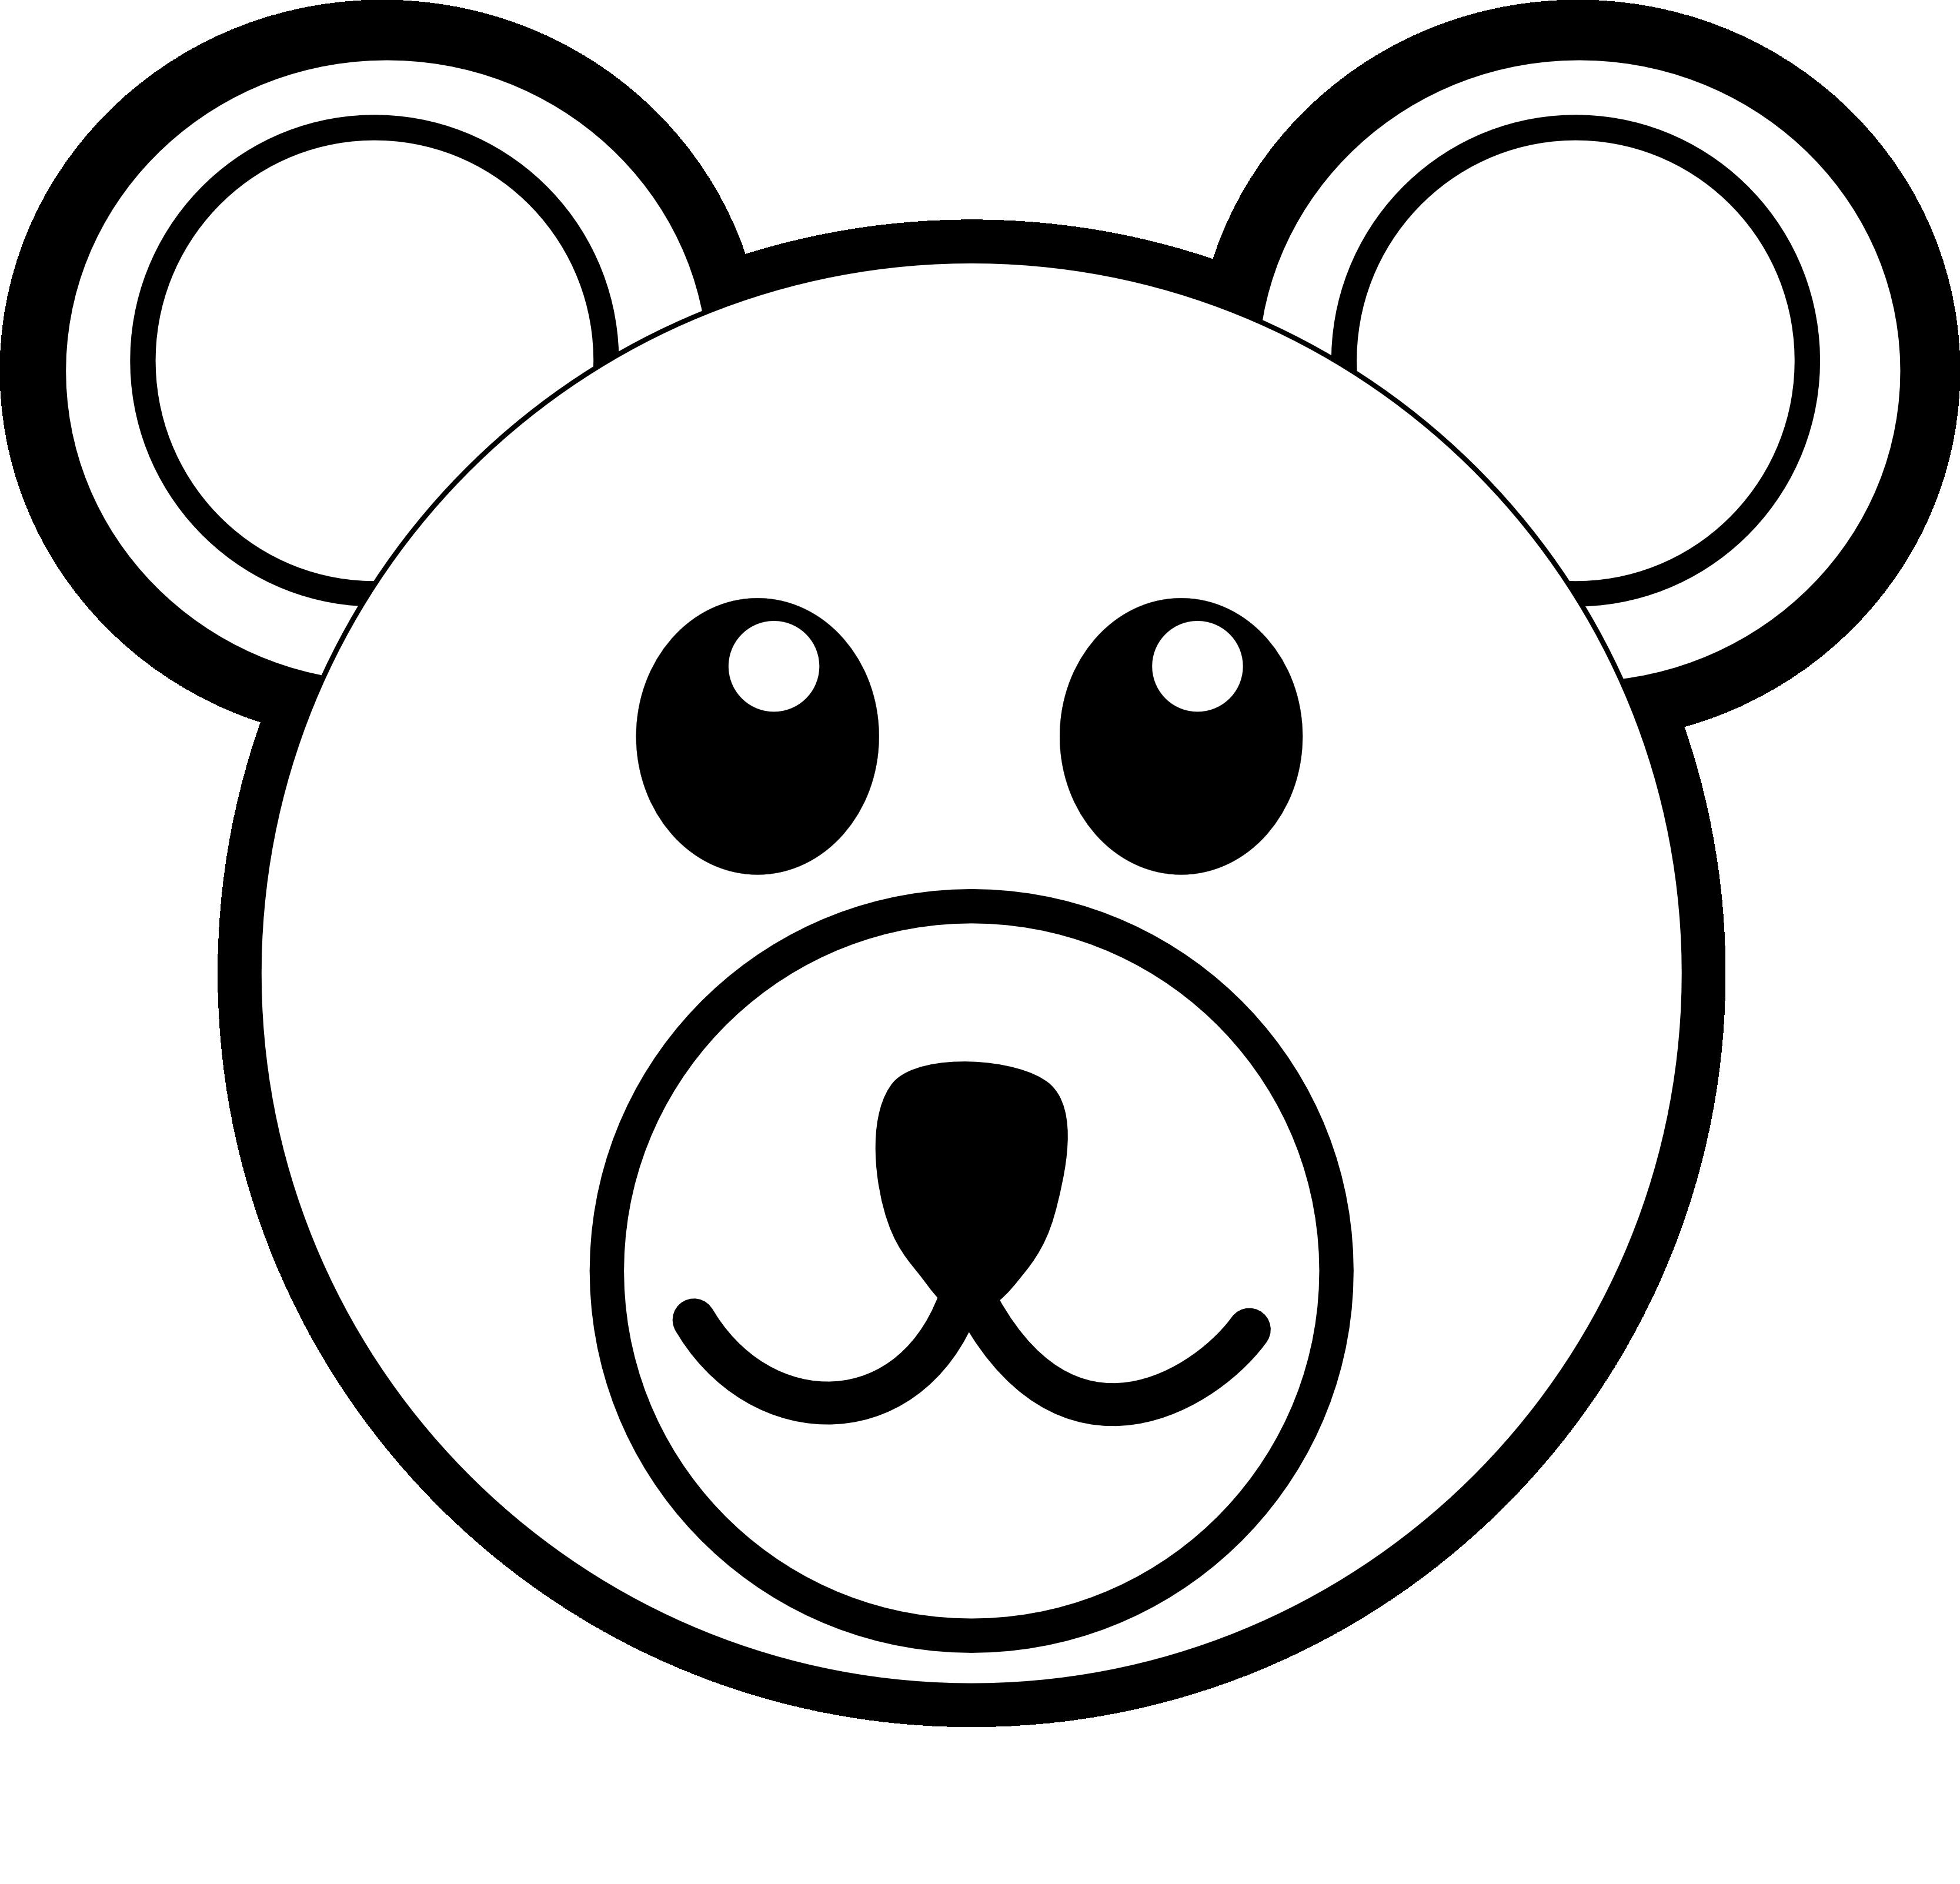 vector free stock Bobcat clipart face. Grizzly bear panda free